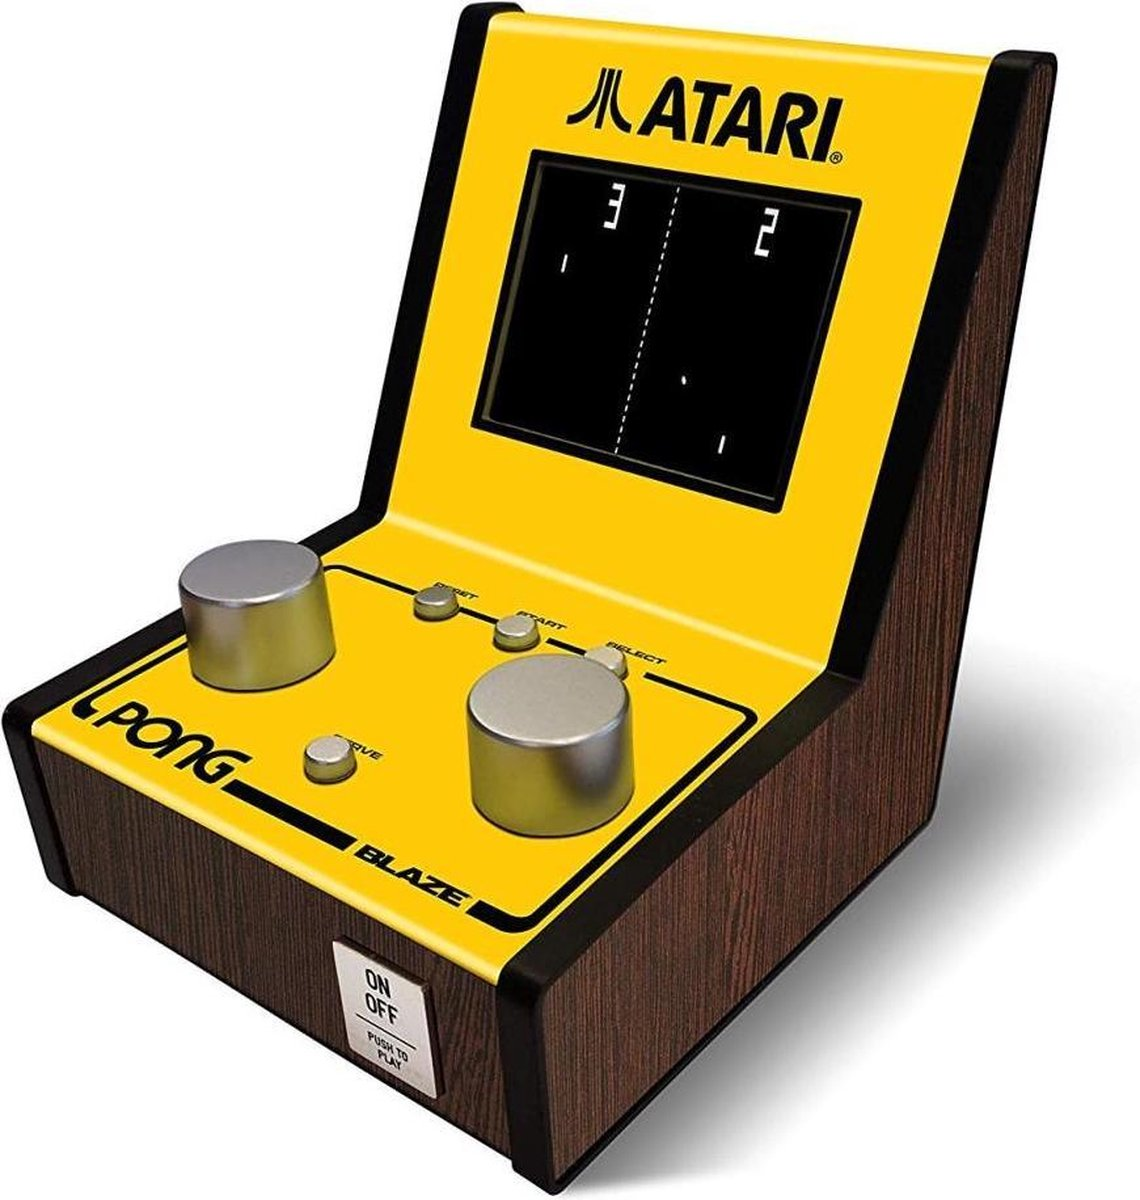 Atari Mini Arcade - Pong